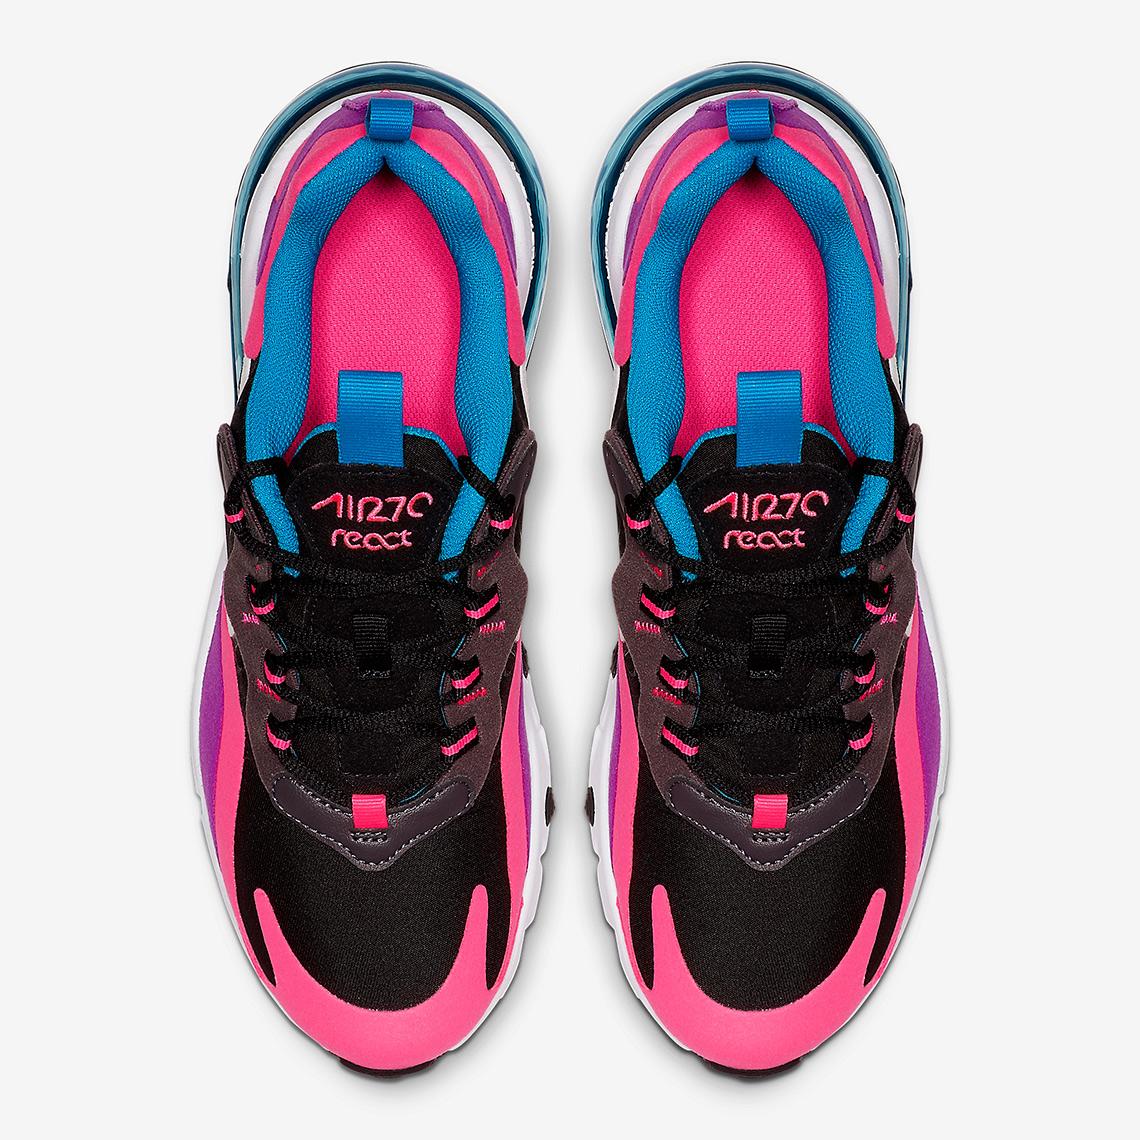 Nike Air Max 270 React BlackWhite Hyper Pink Vivid Purple